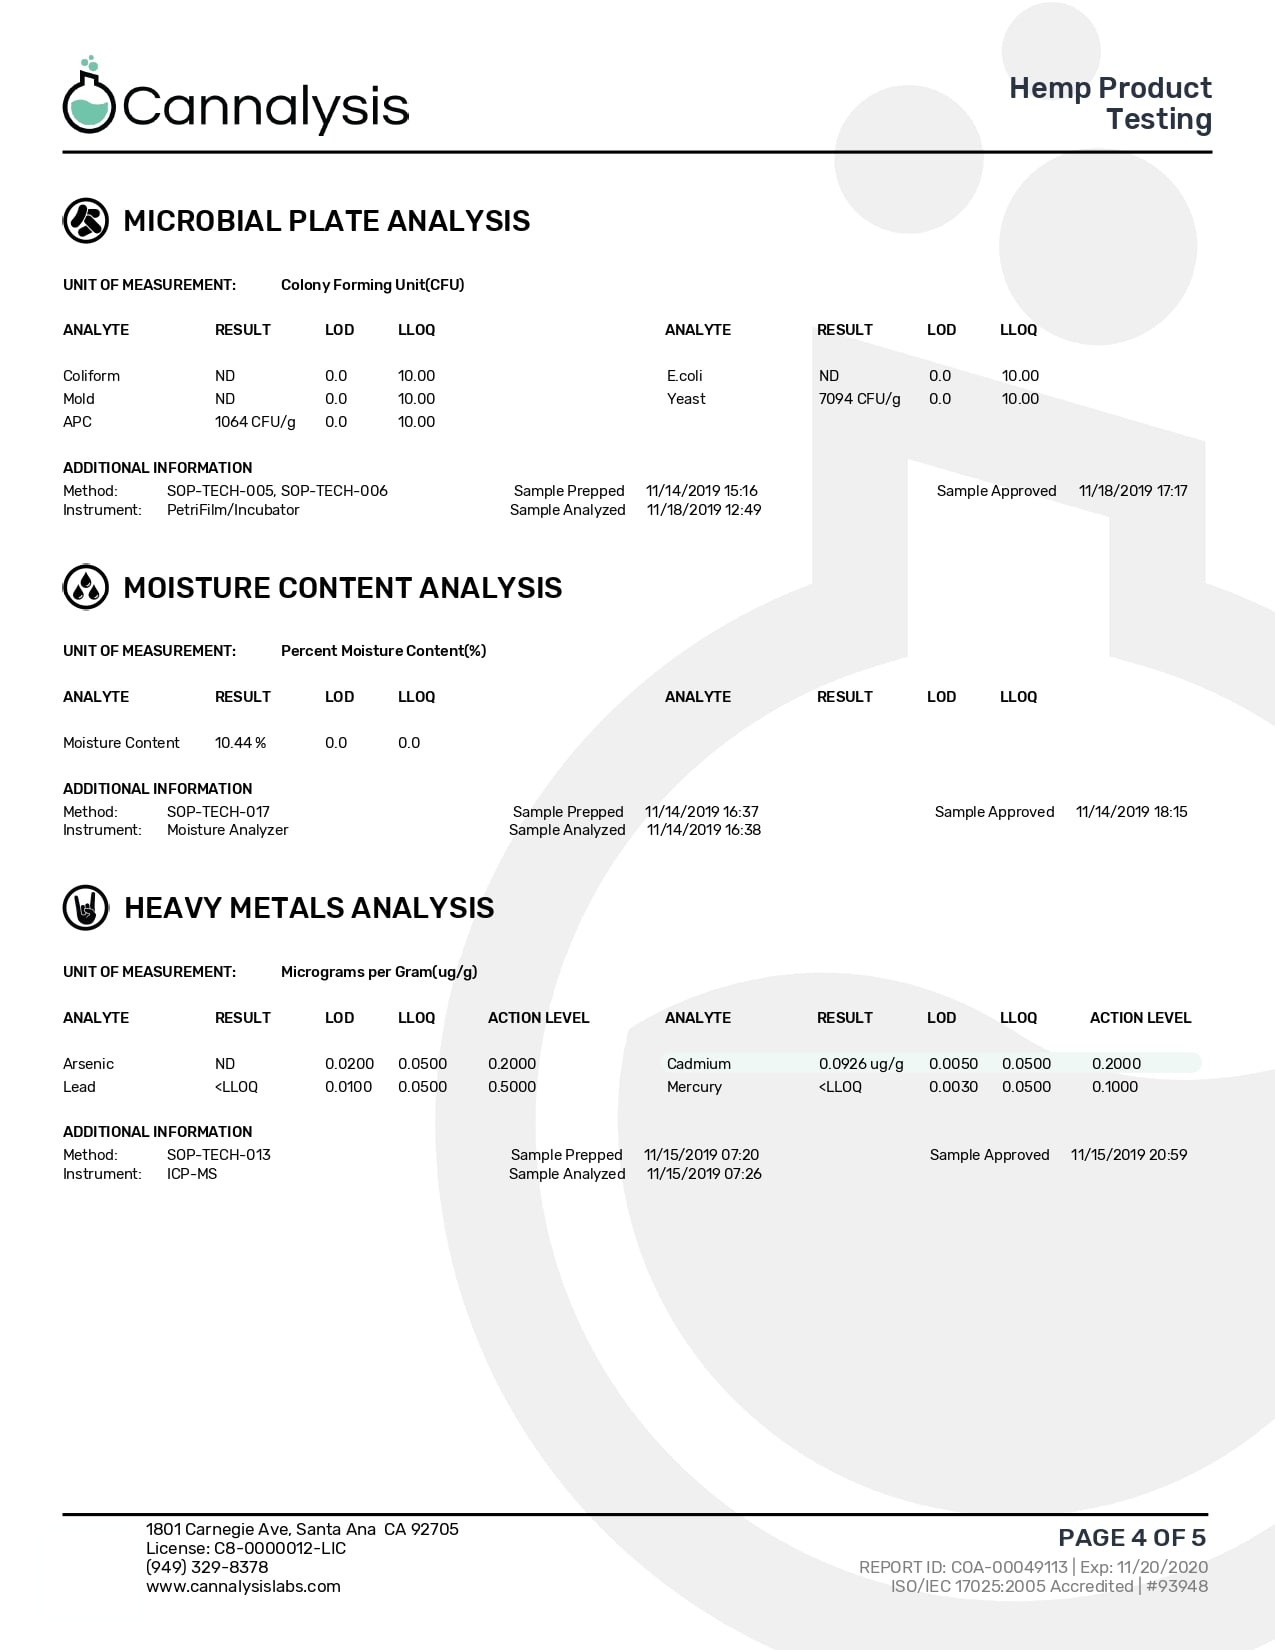 Root Wellness Hemp Awaken Pre Roll 2 Pack Lab Report